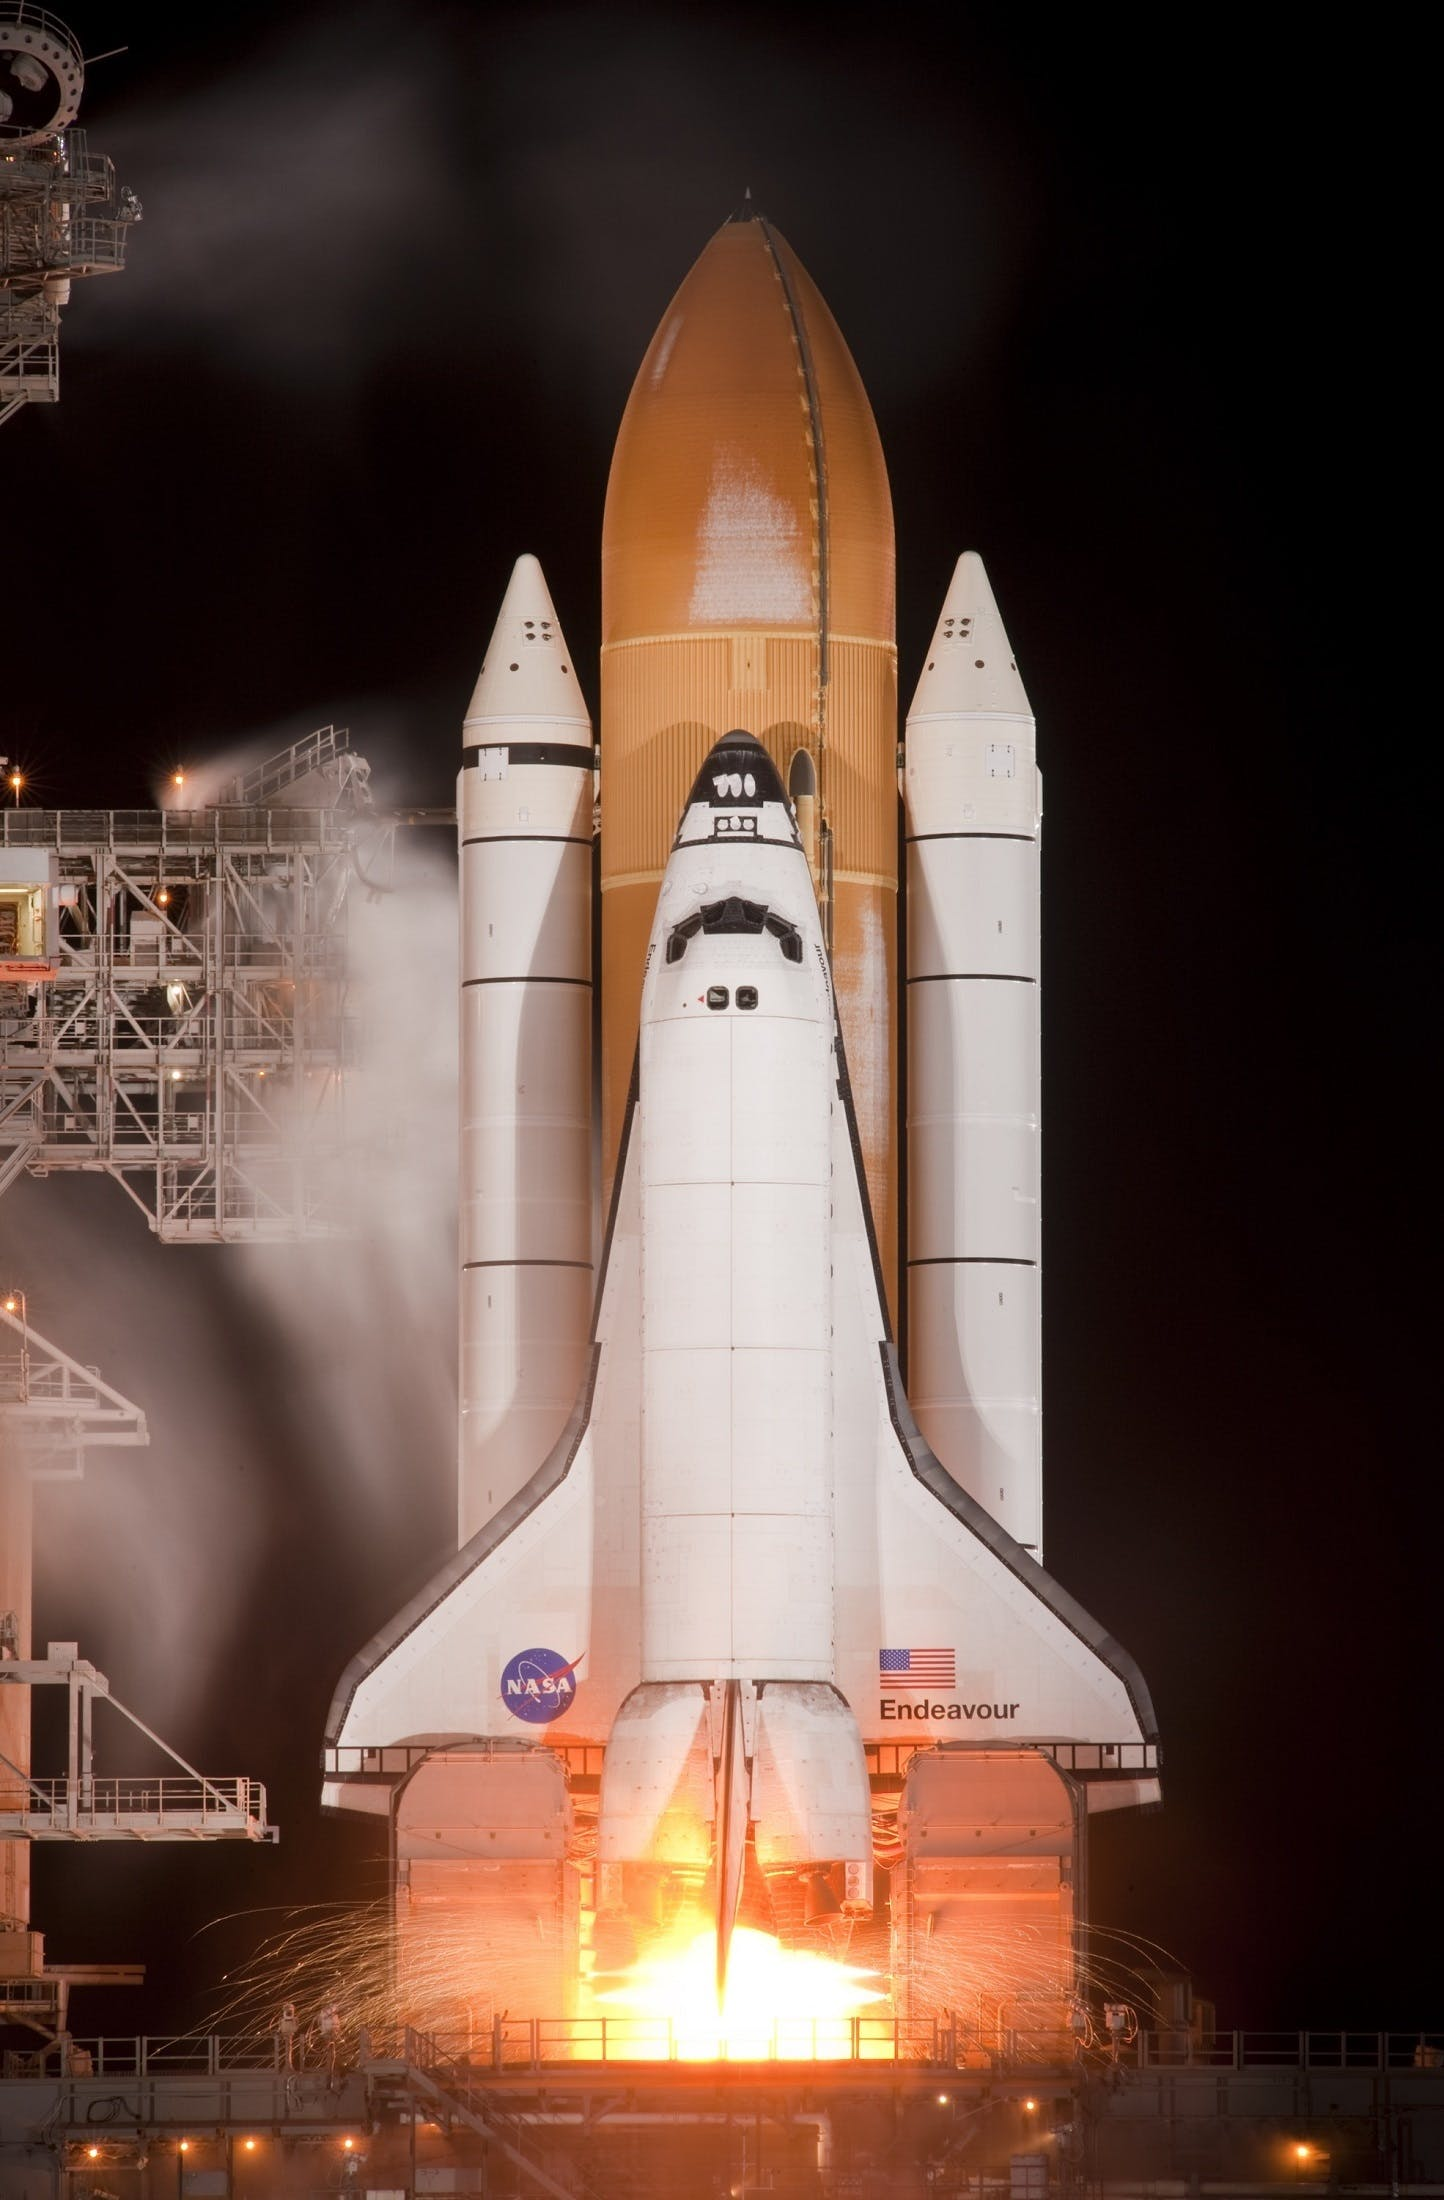 Nasa Space Shuttle Taking Off